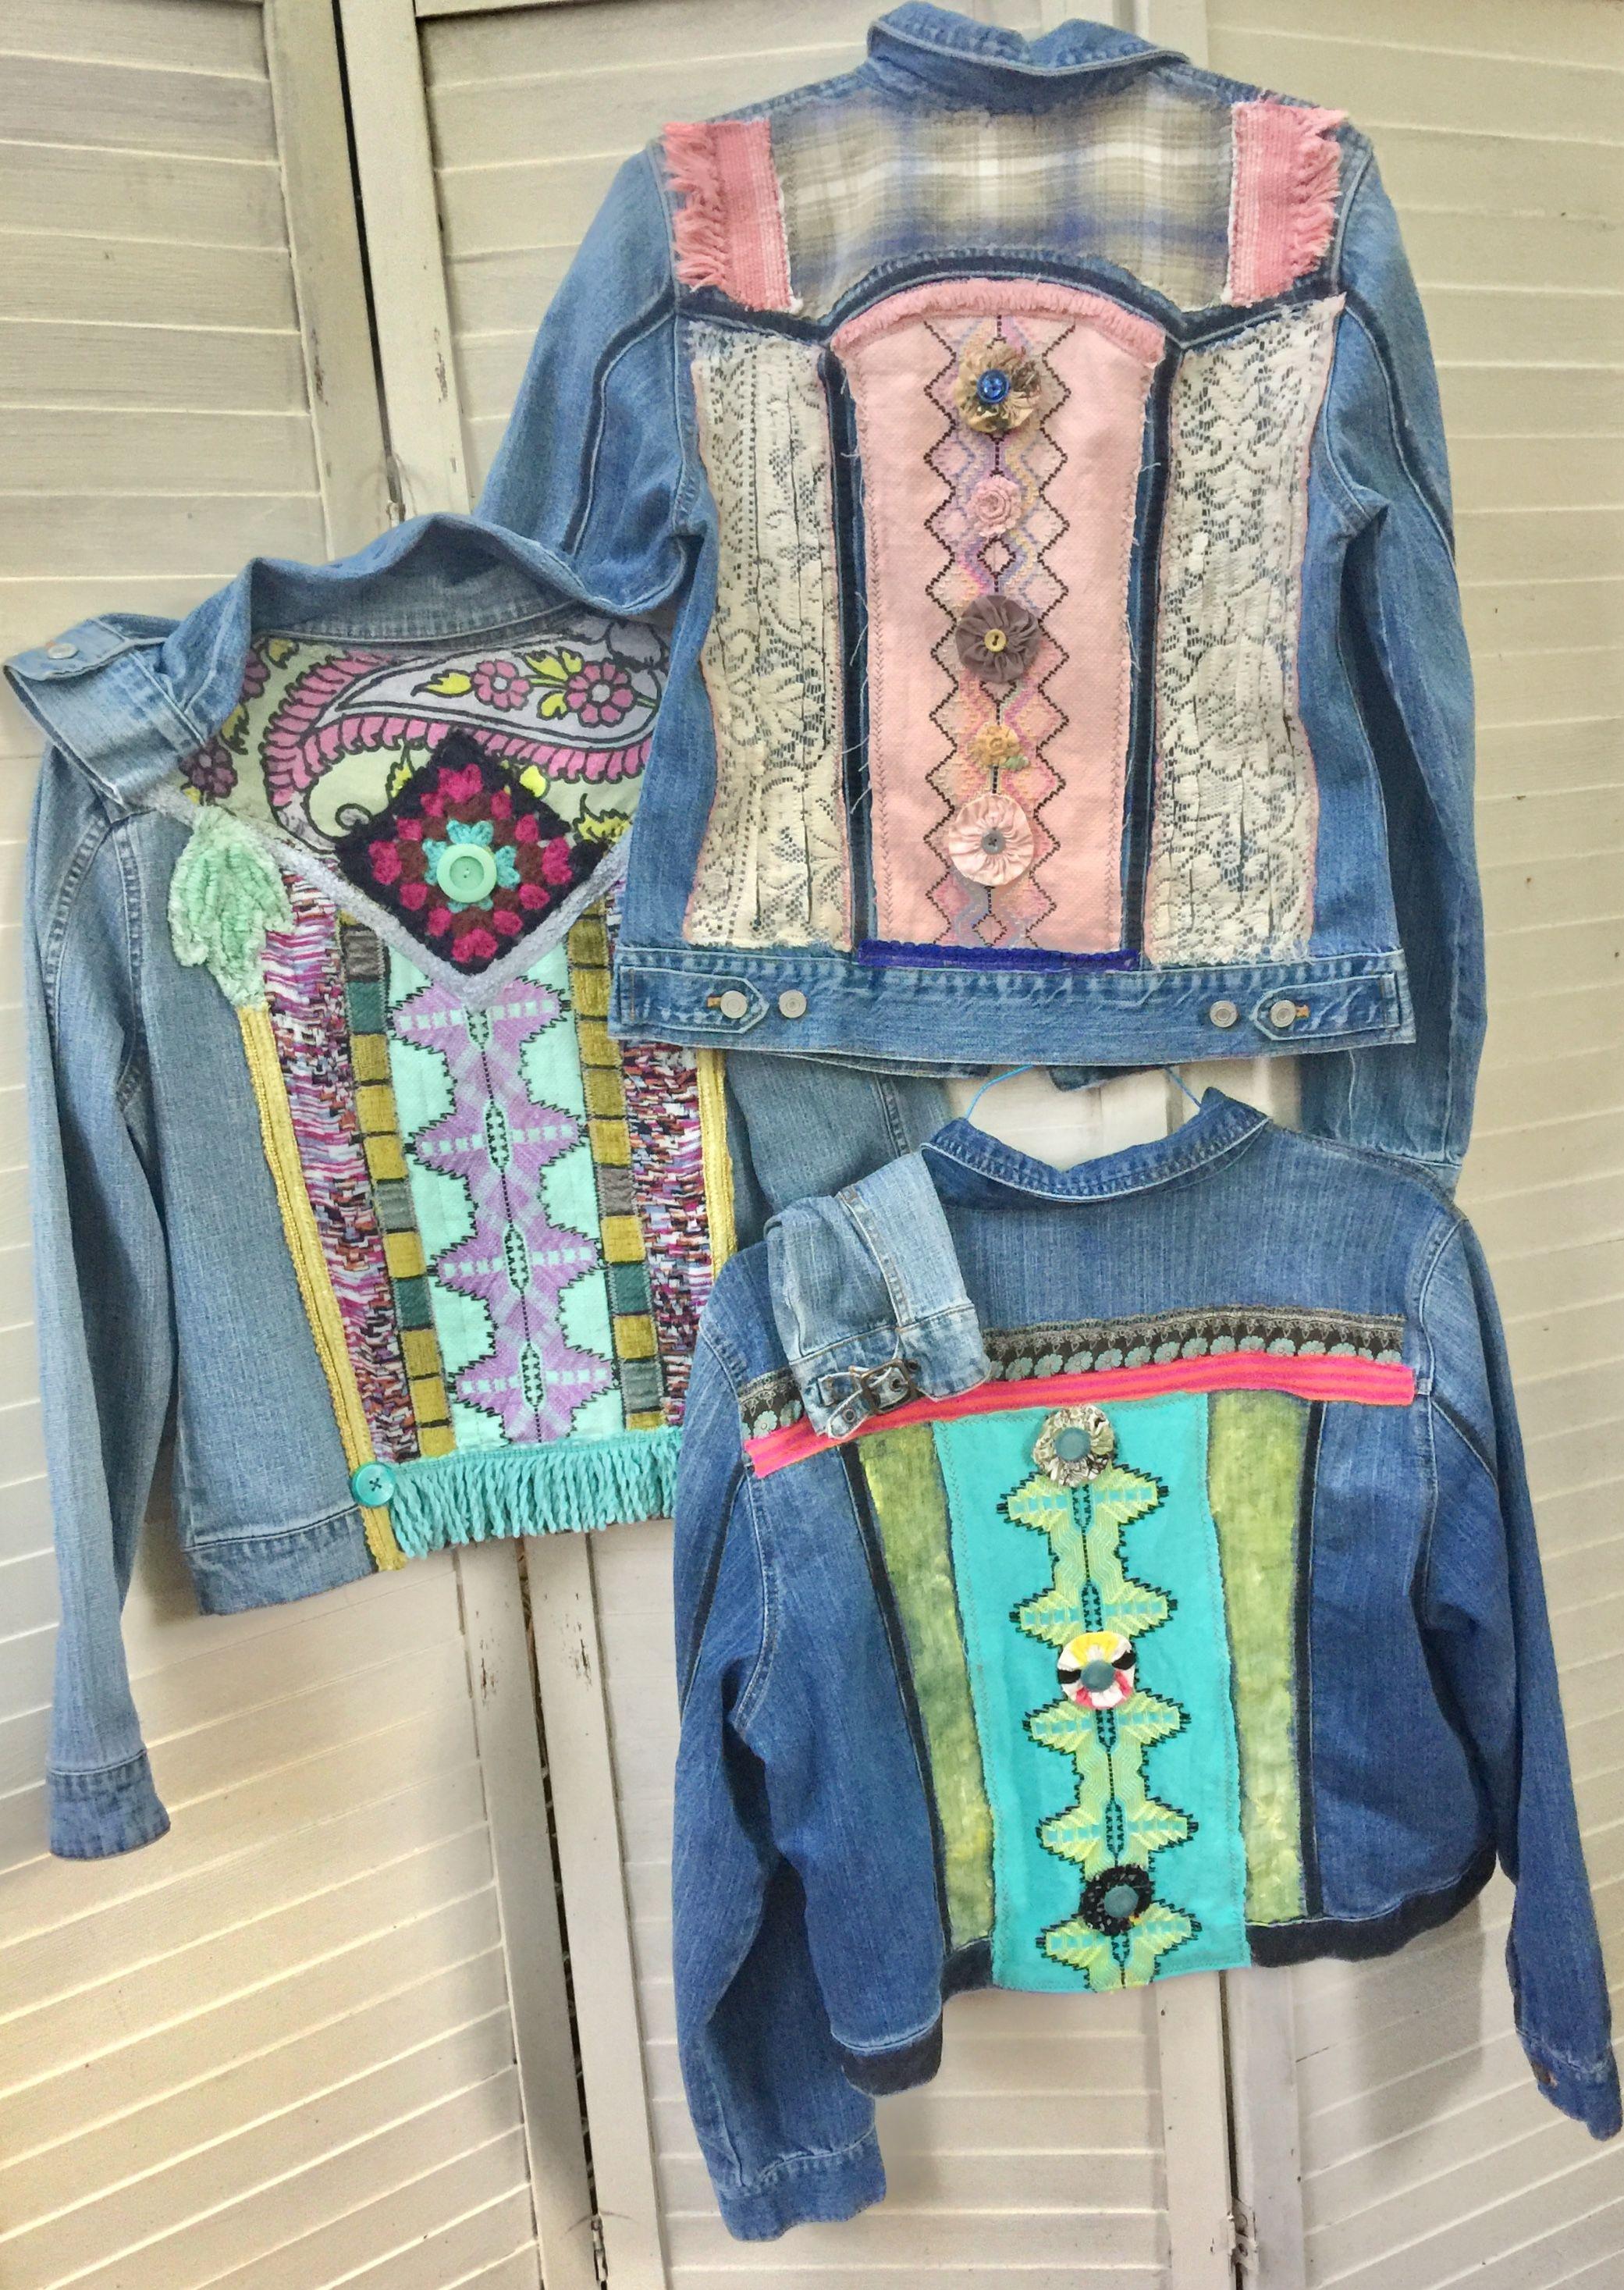 Sew Lace And Interesting Fabrics On A Denim Jacket